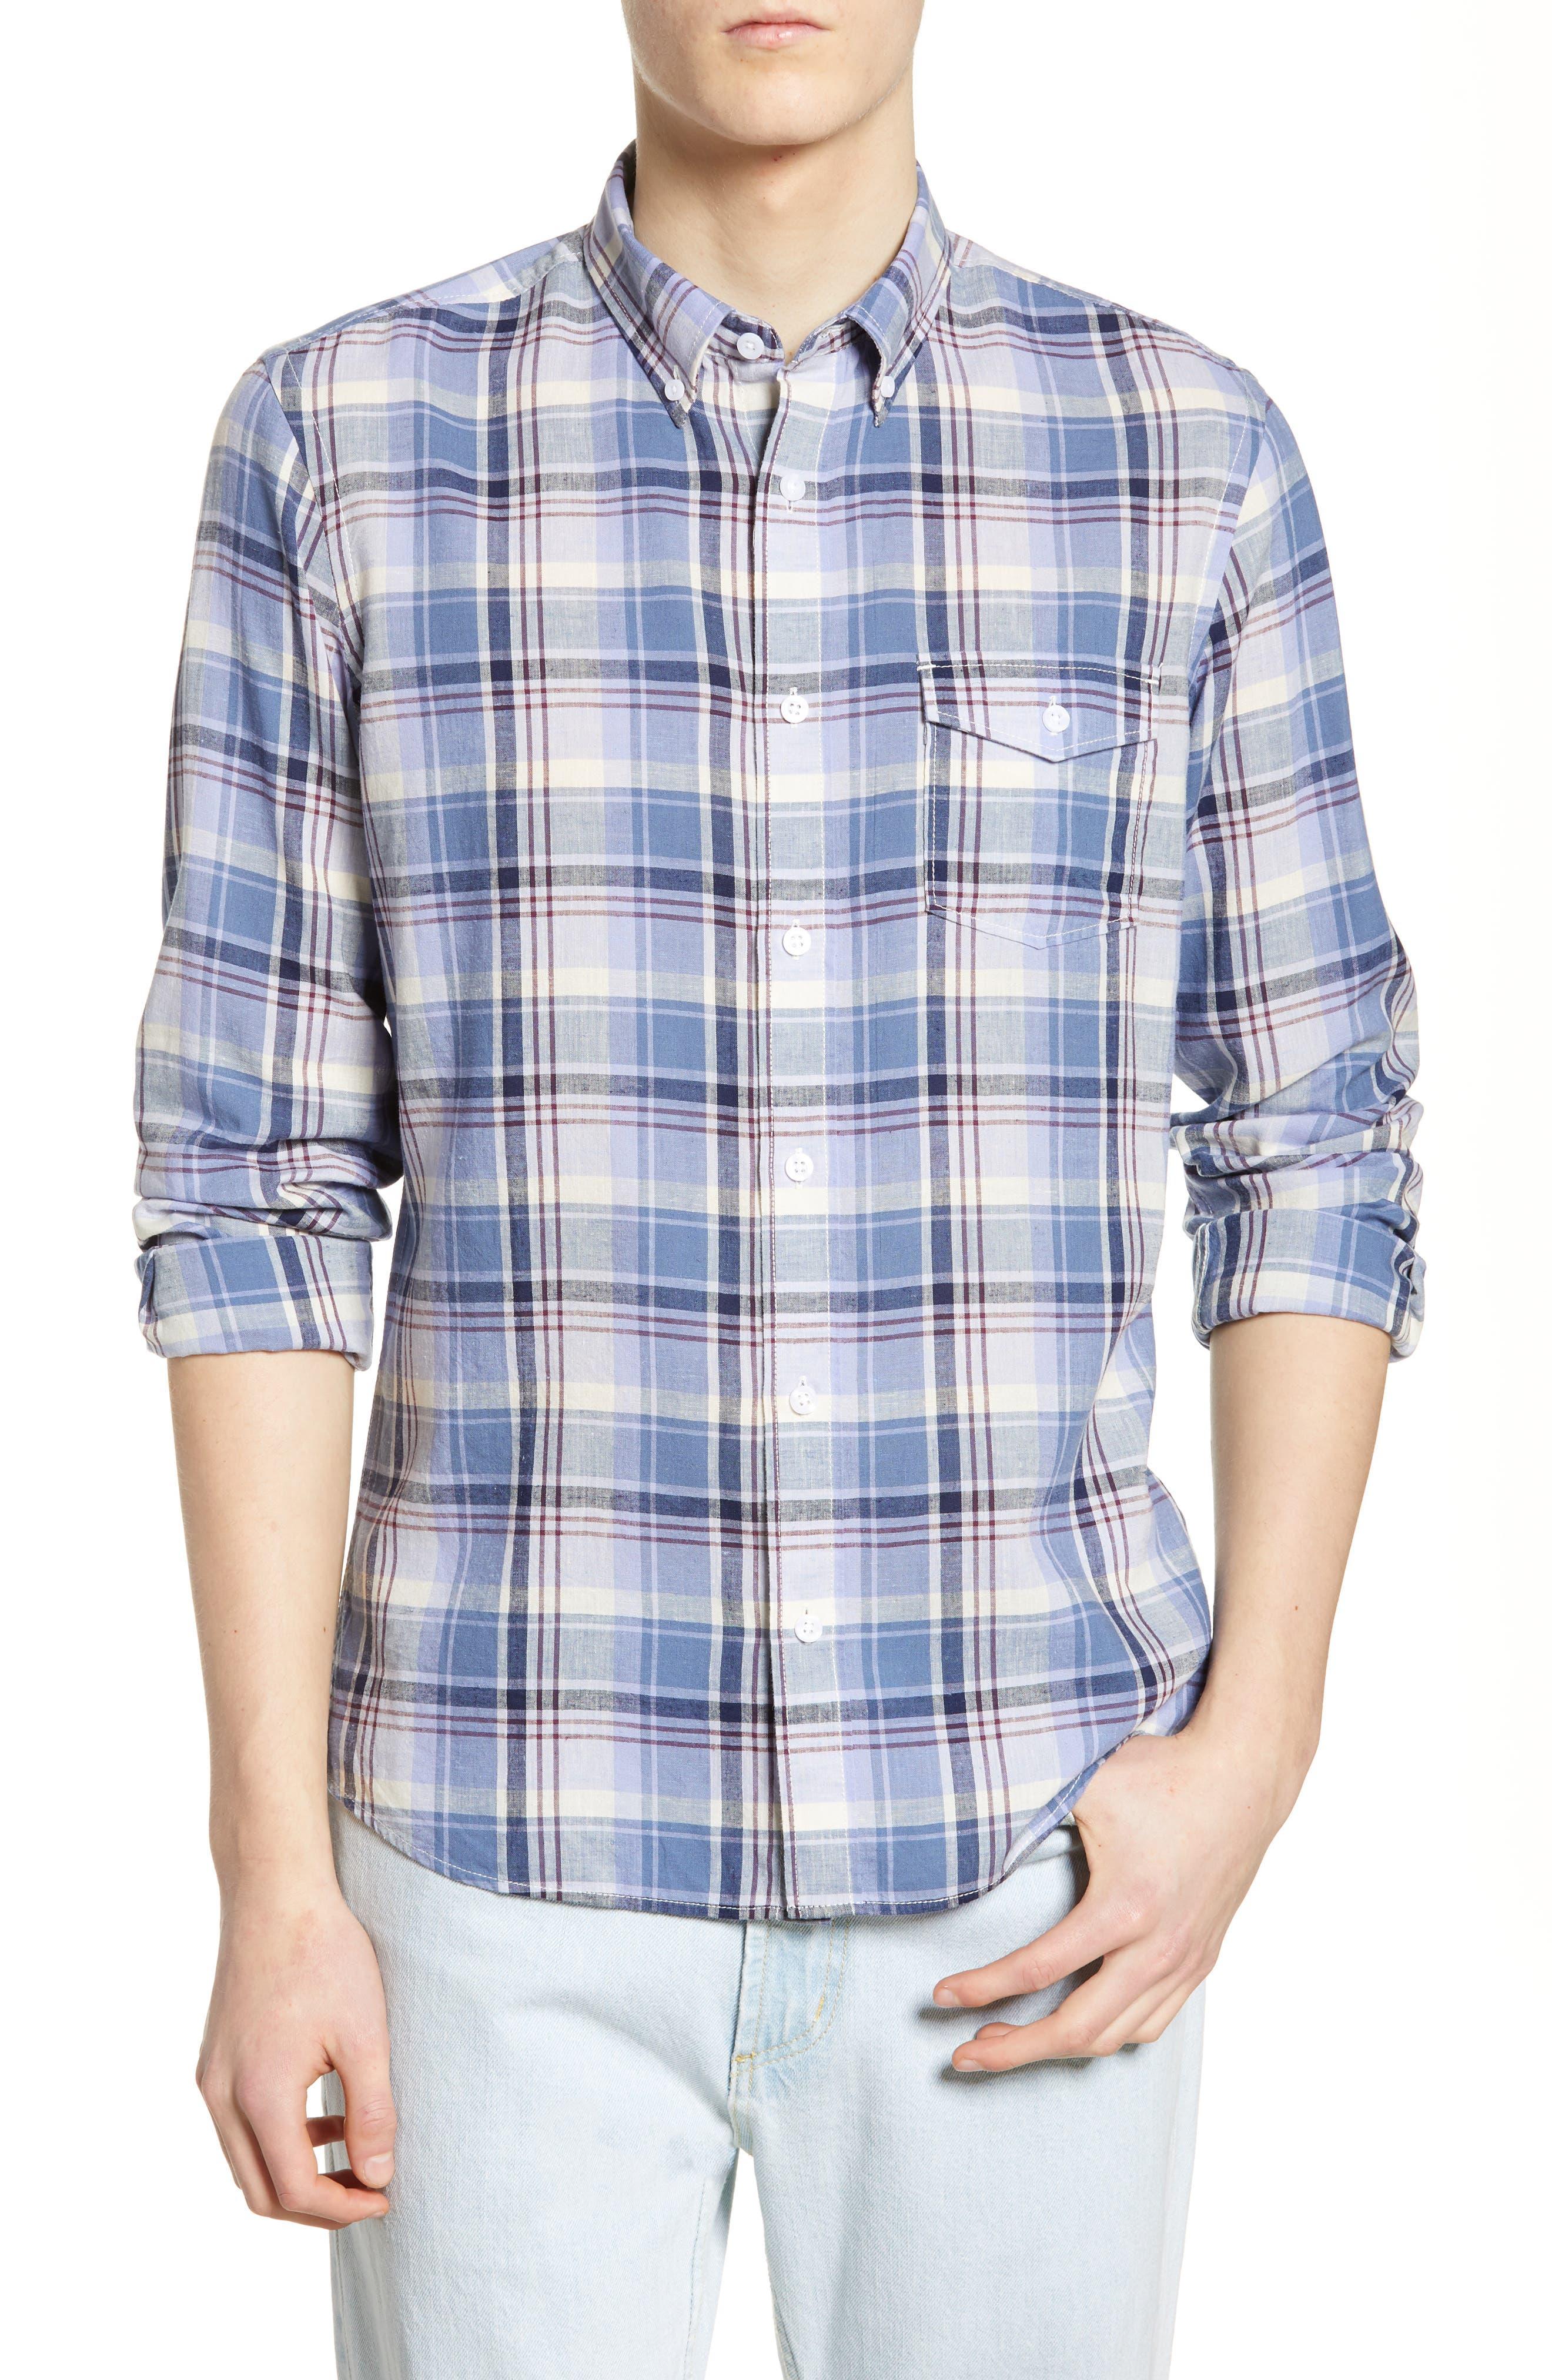 Nordstrom Shop Regular Fit Plaid Sport Shirt, Blue